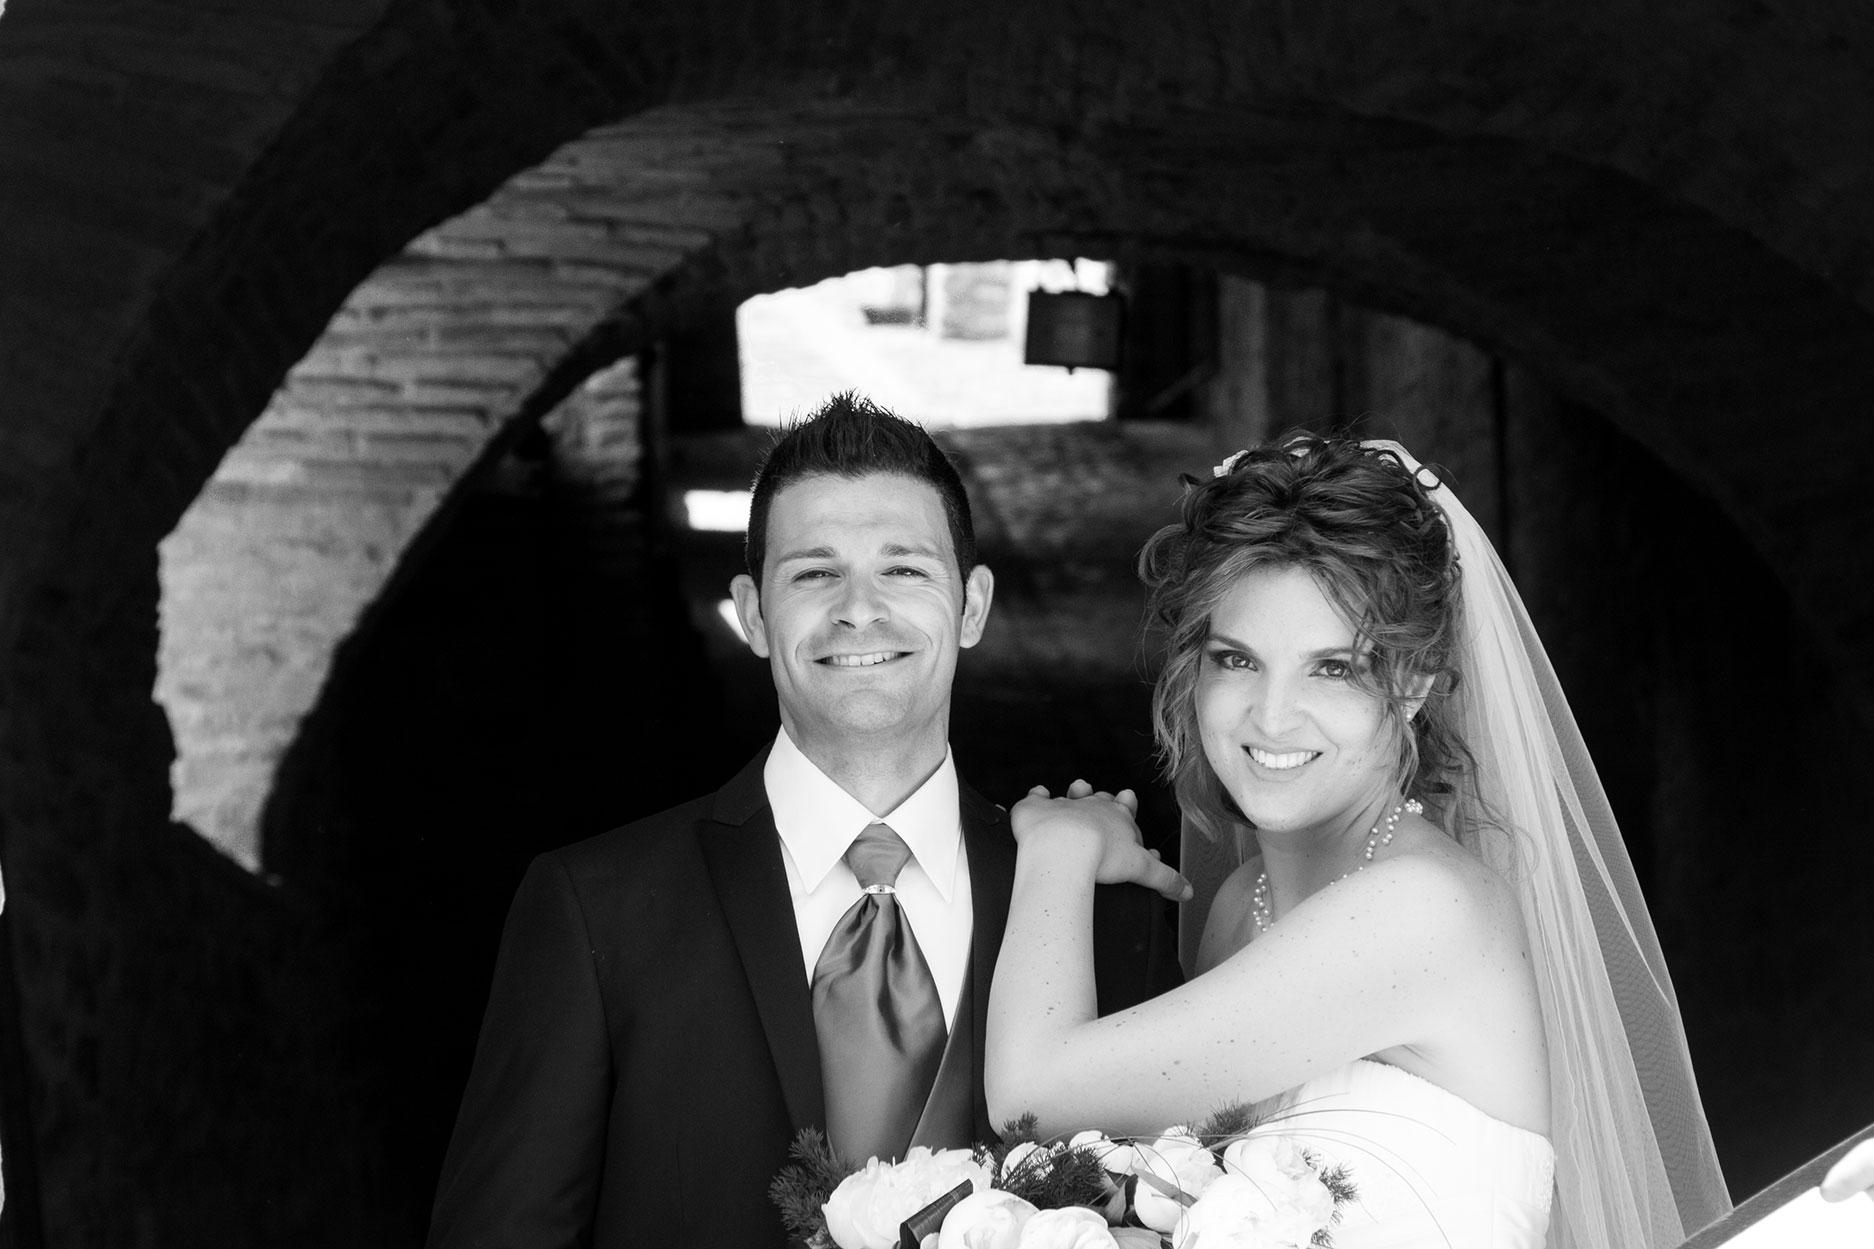 Francesca-Ferrati-wedding-photographer-Verona-Federica-Giovanni27